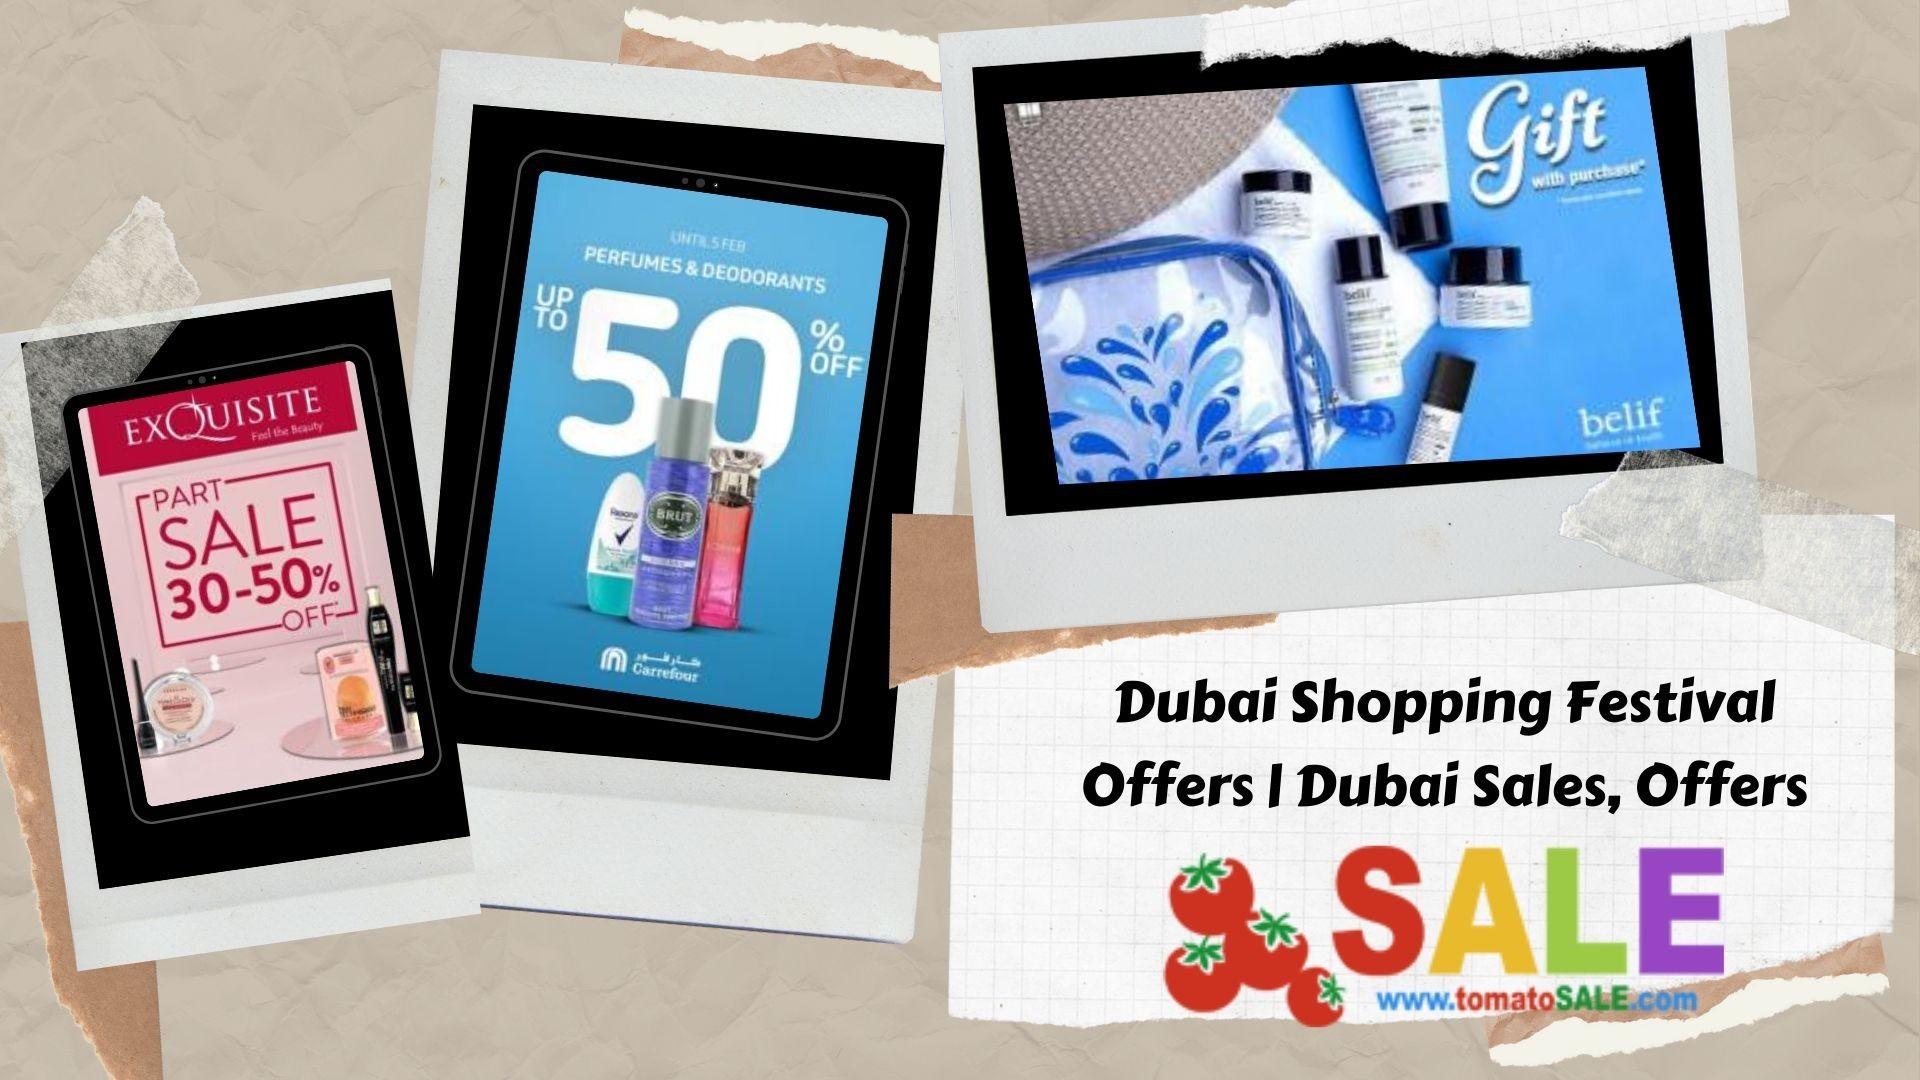 Dubai Shopping Festival Offers